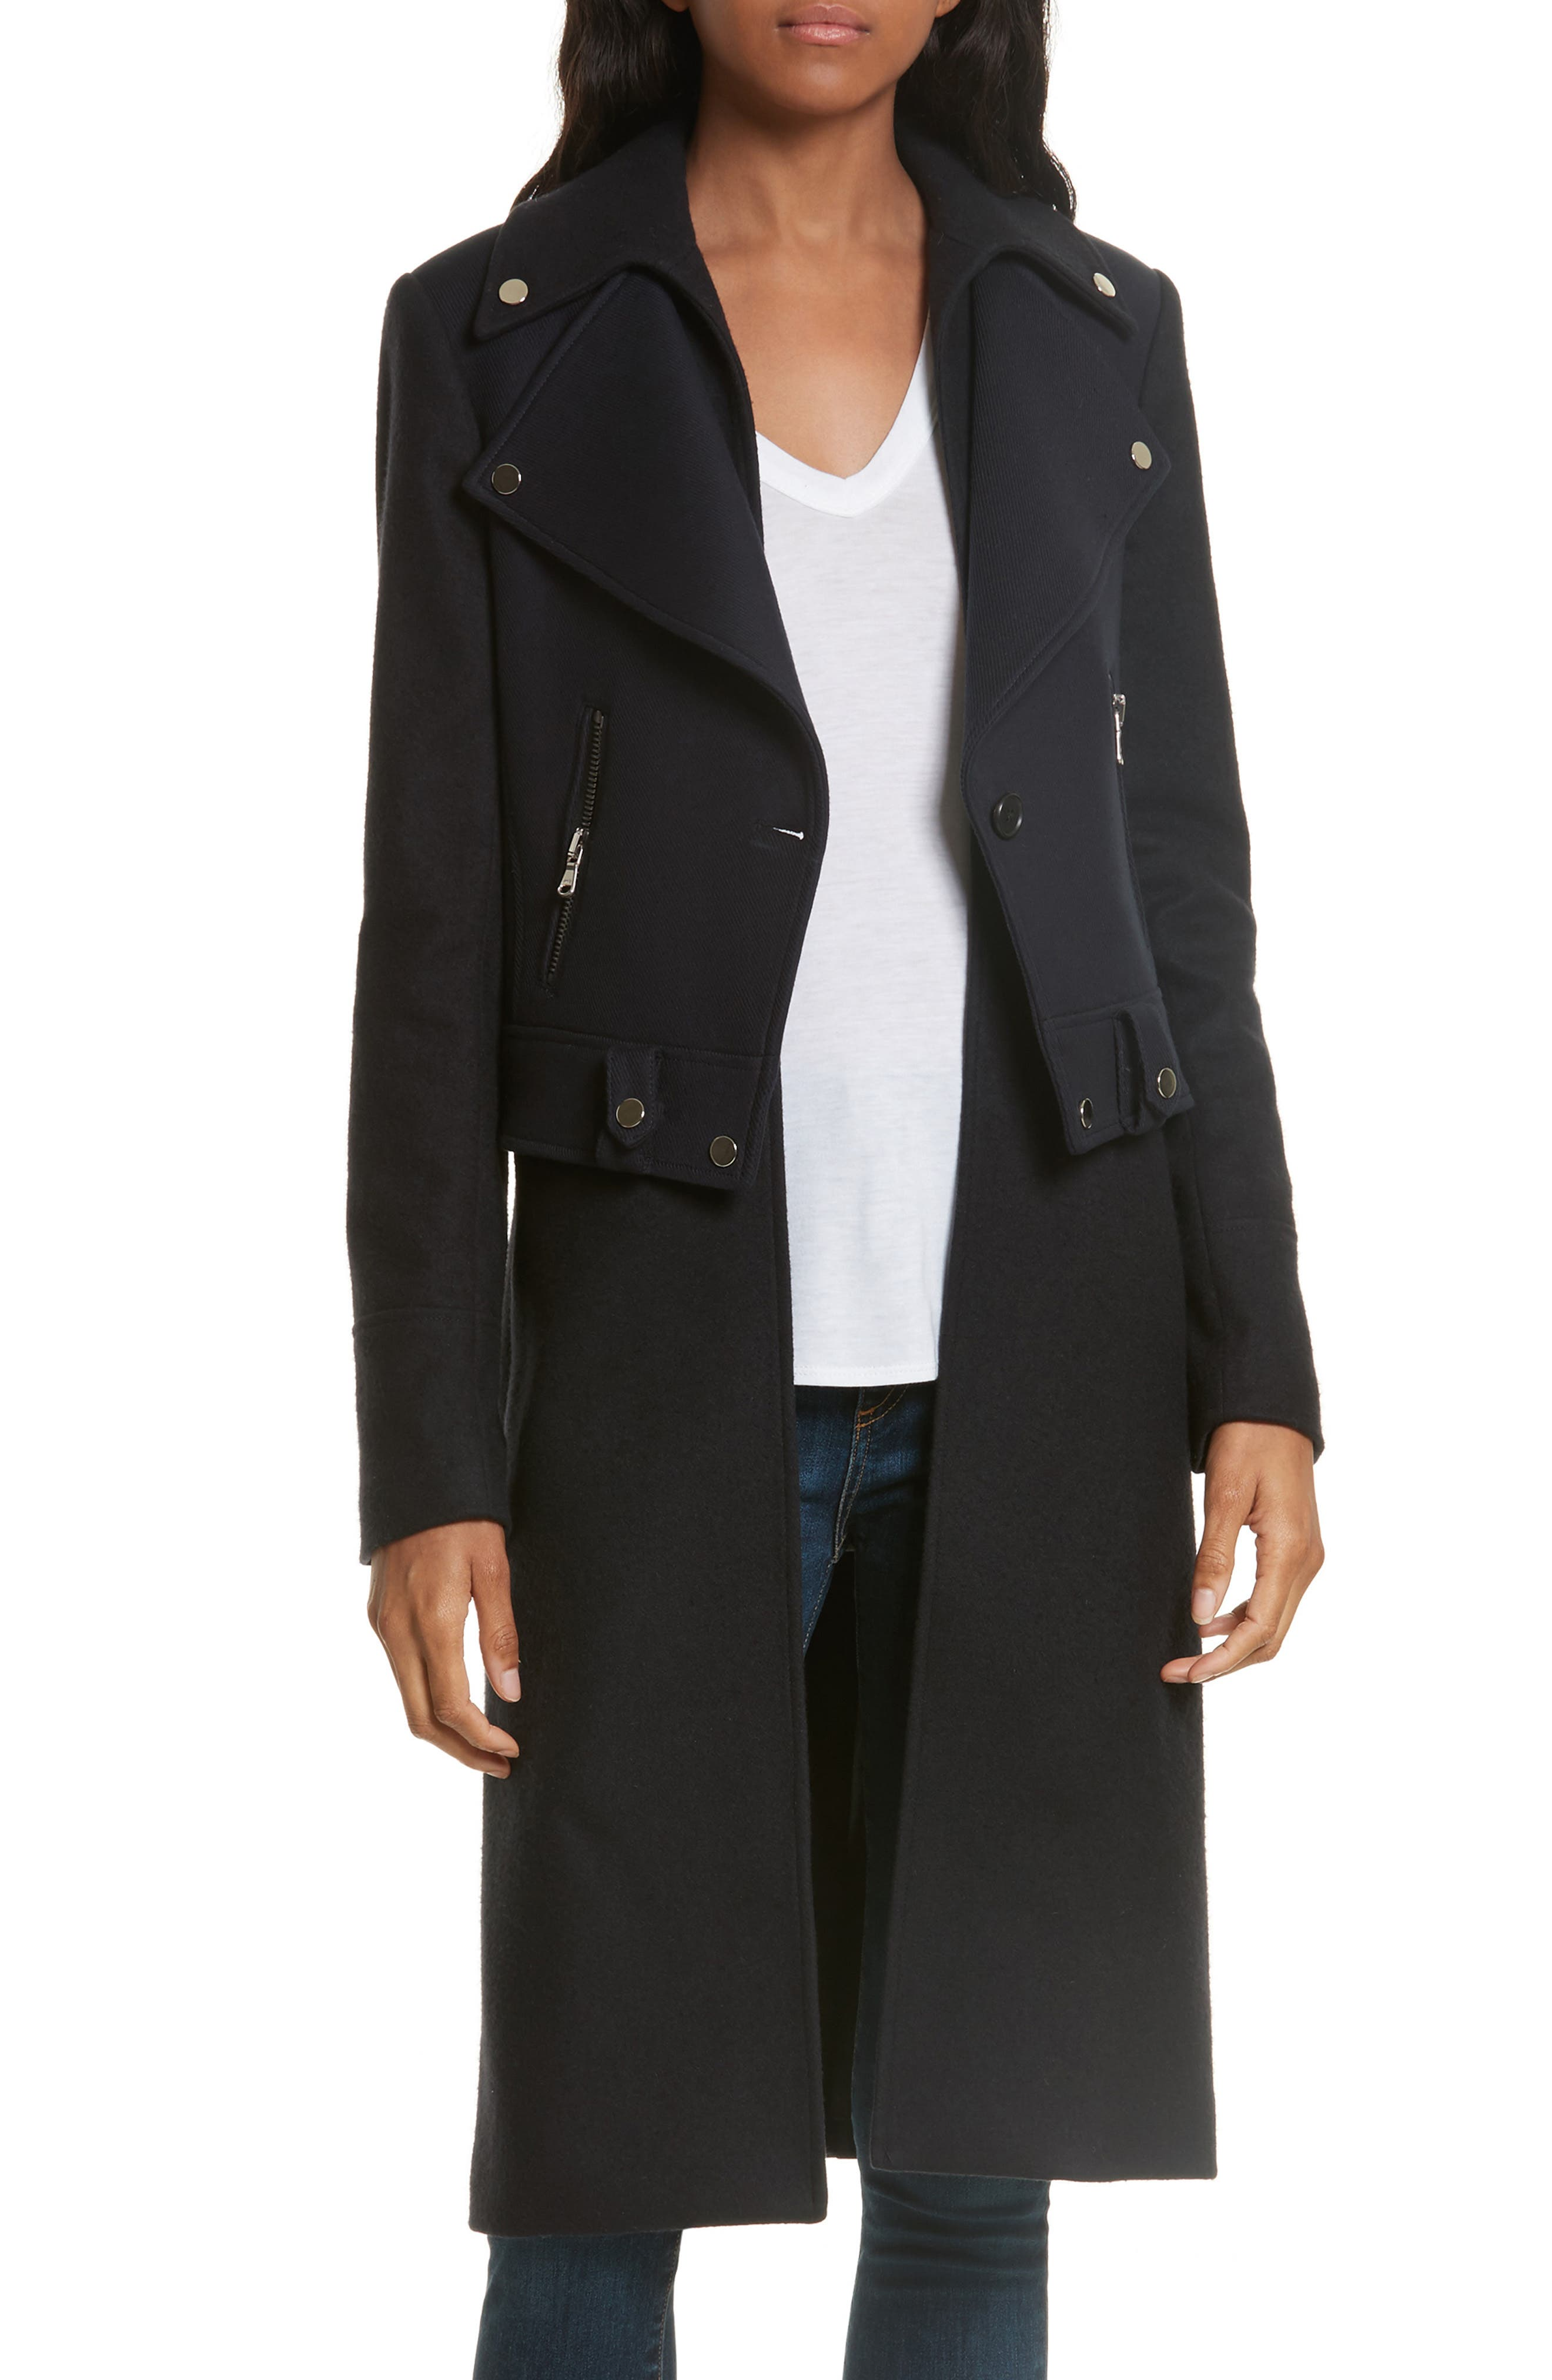 Main Image - Veronica Beard Alcott Wool & Cashmere Blend Vest Coat